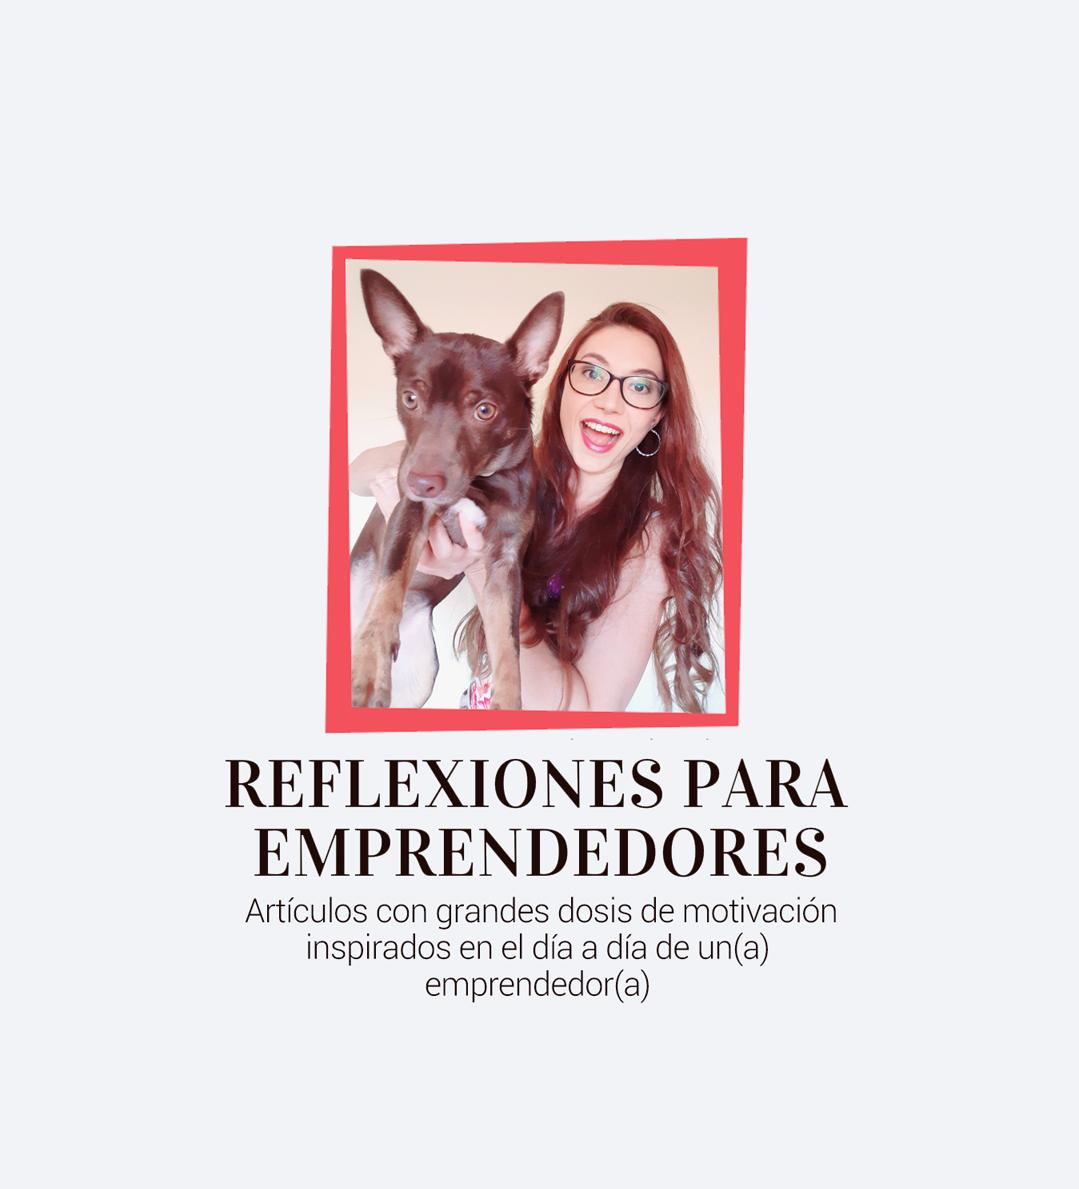 https://www.monicachacin.com/wp-content/uploads/2020/07/Reflexiones-para-emprendedores-MOVIL-opt02.jpg